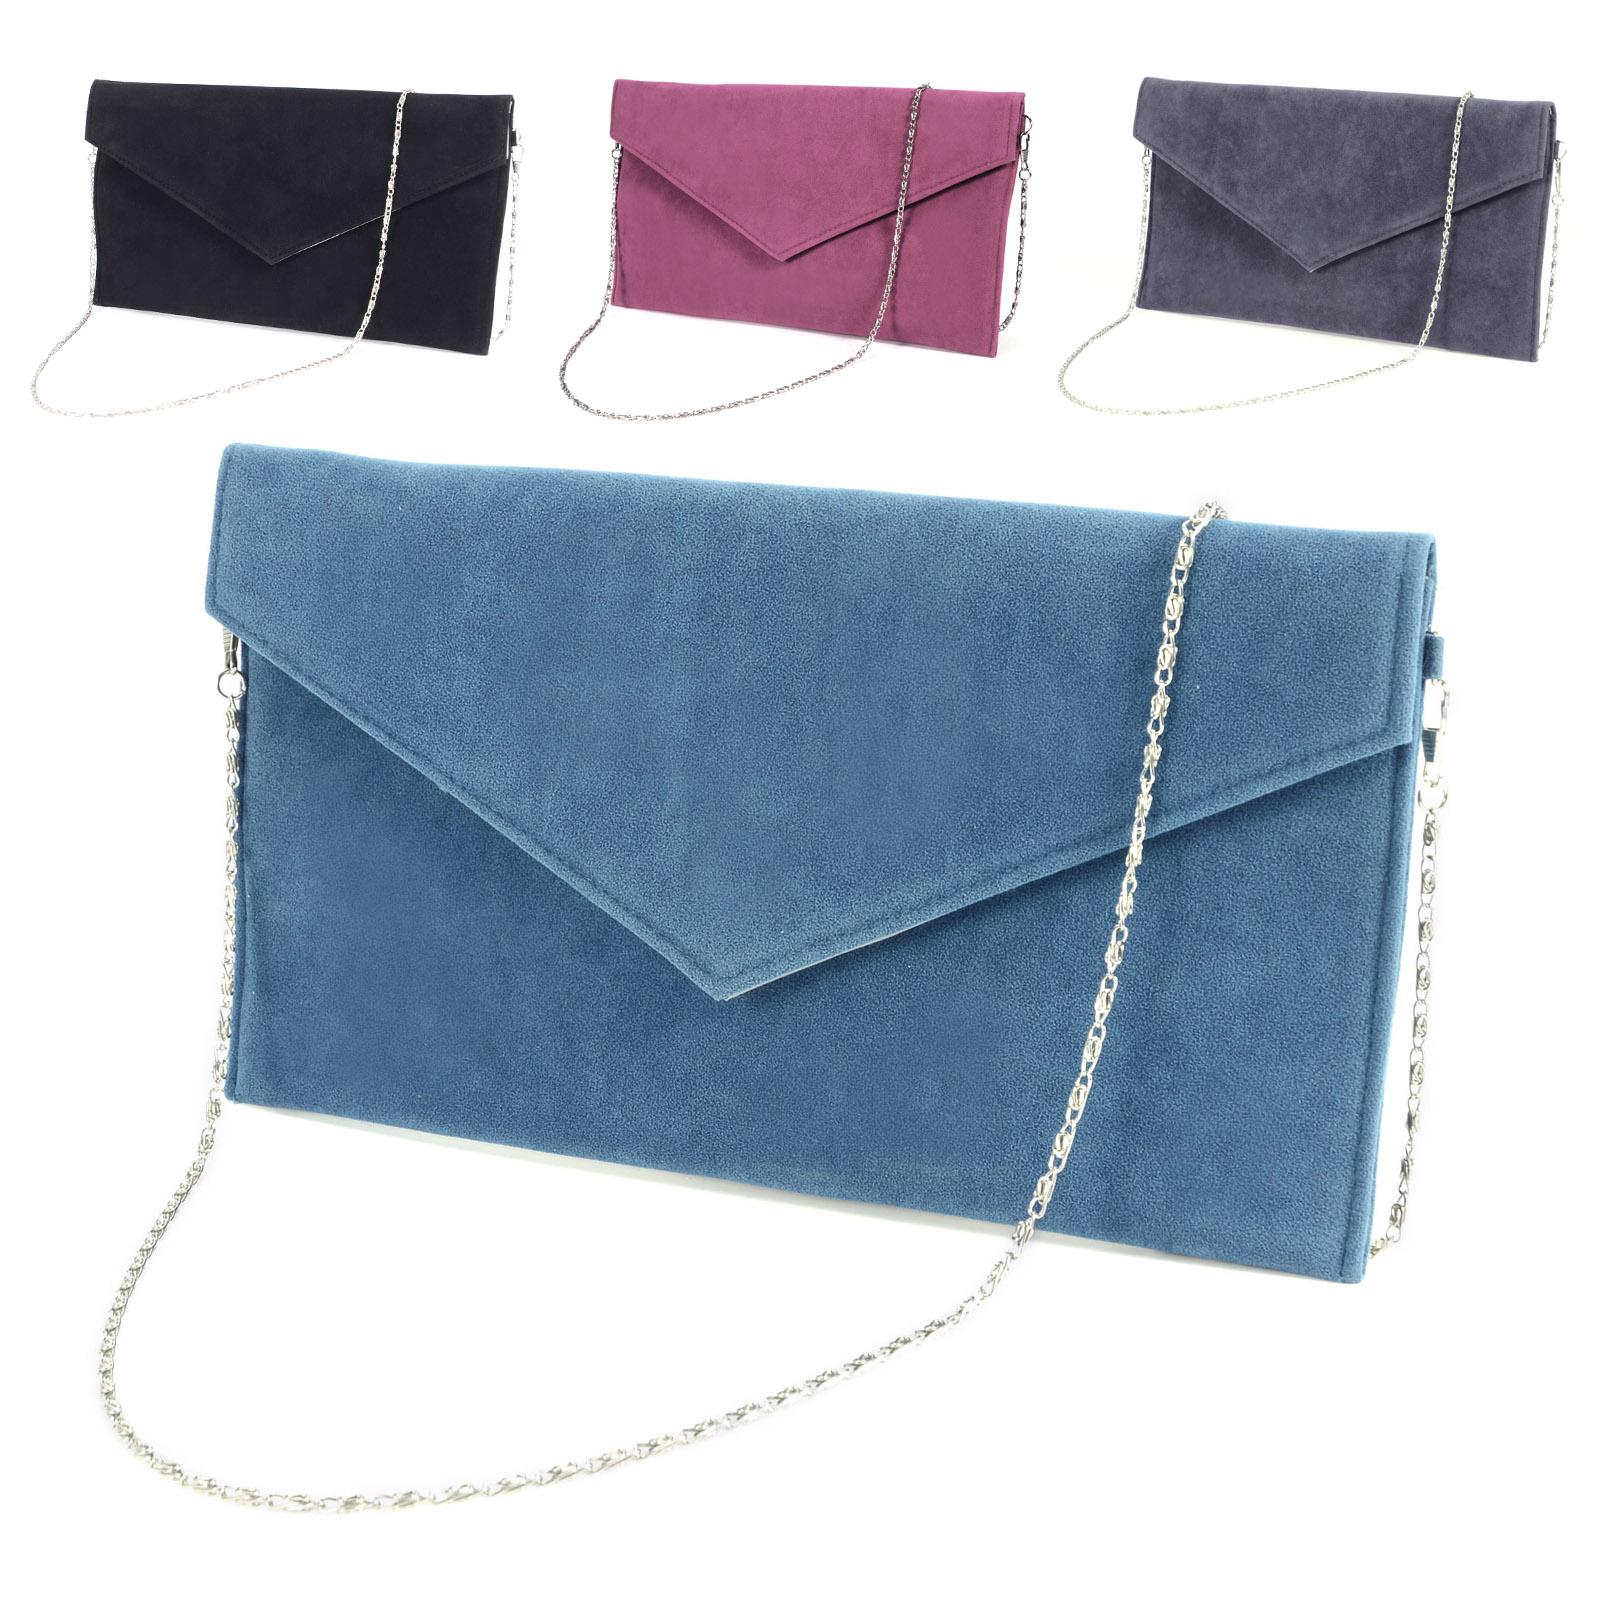 Details about Large Faux Suede Envelope Clutch W  Wrist Strap Women Hand  Carry Daily Bag Purse 9beb937eeb47d